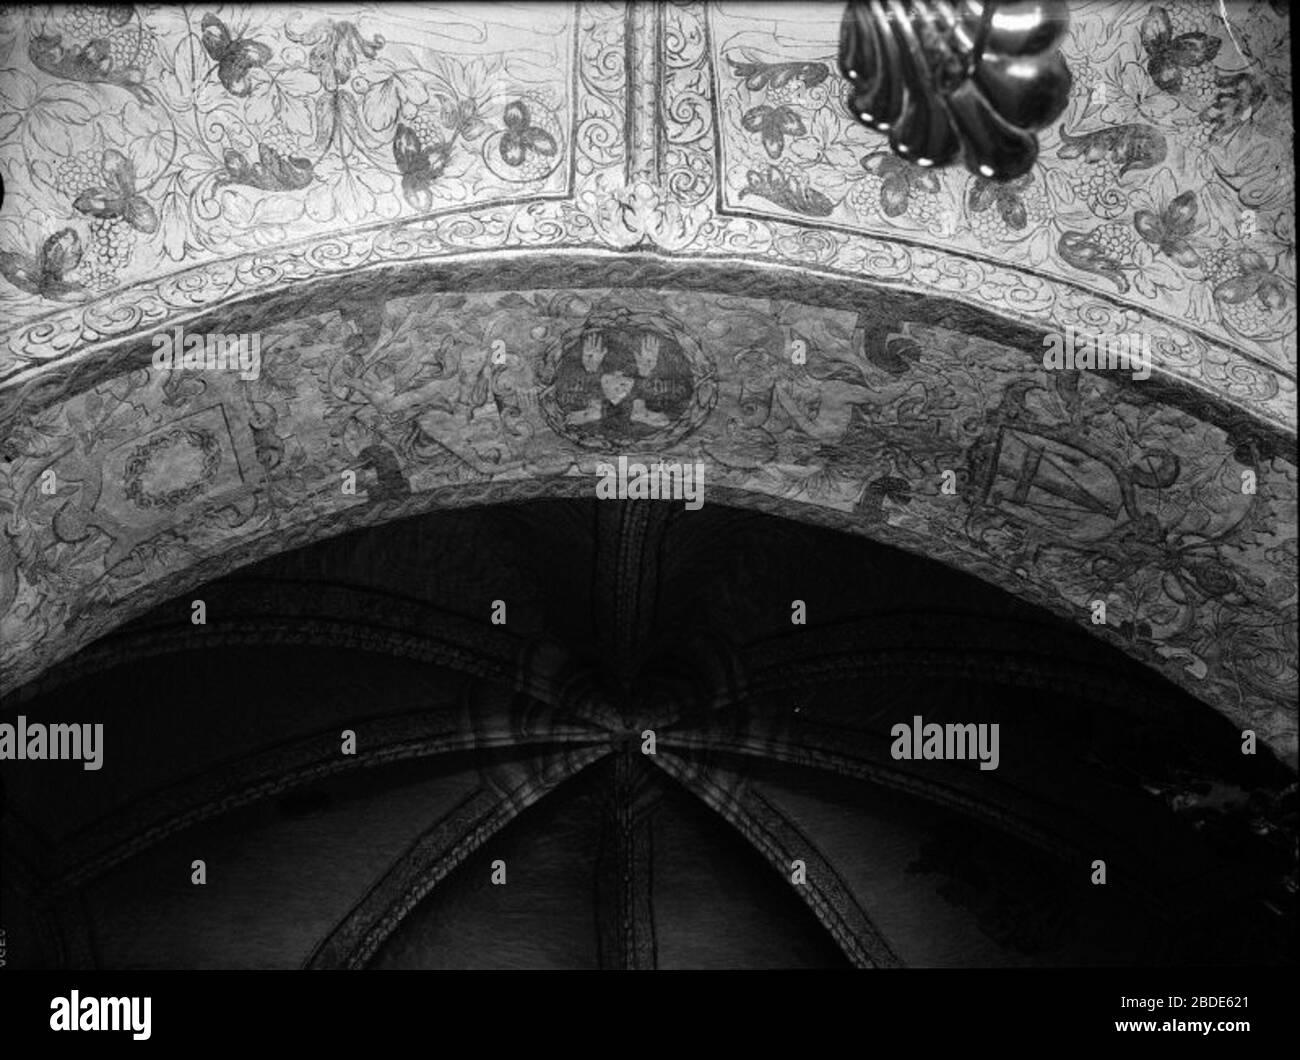 Heliga Korsets kyrka. - Kalmar lns museum / DigitaltMuseum